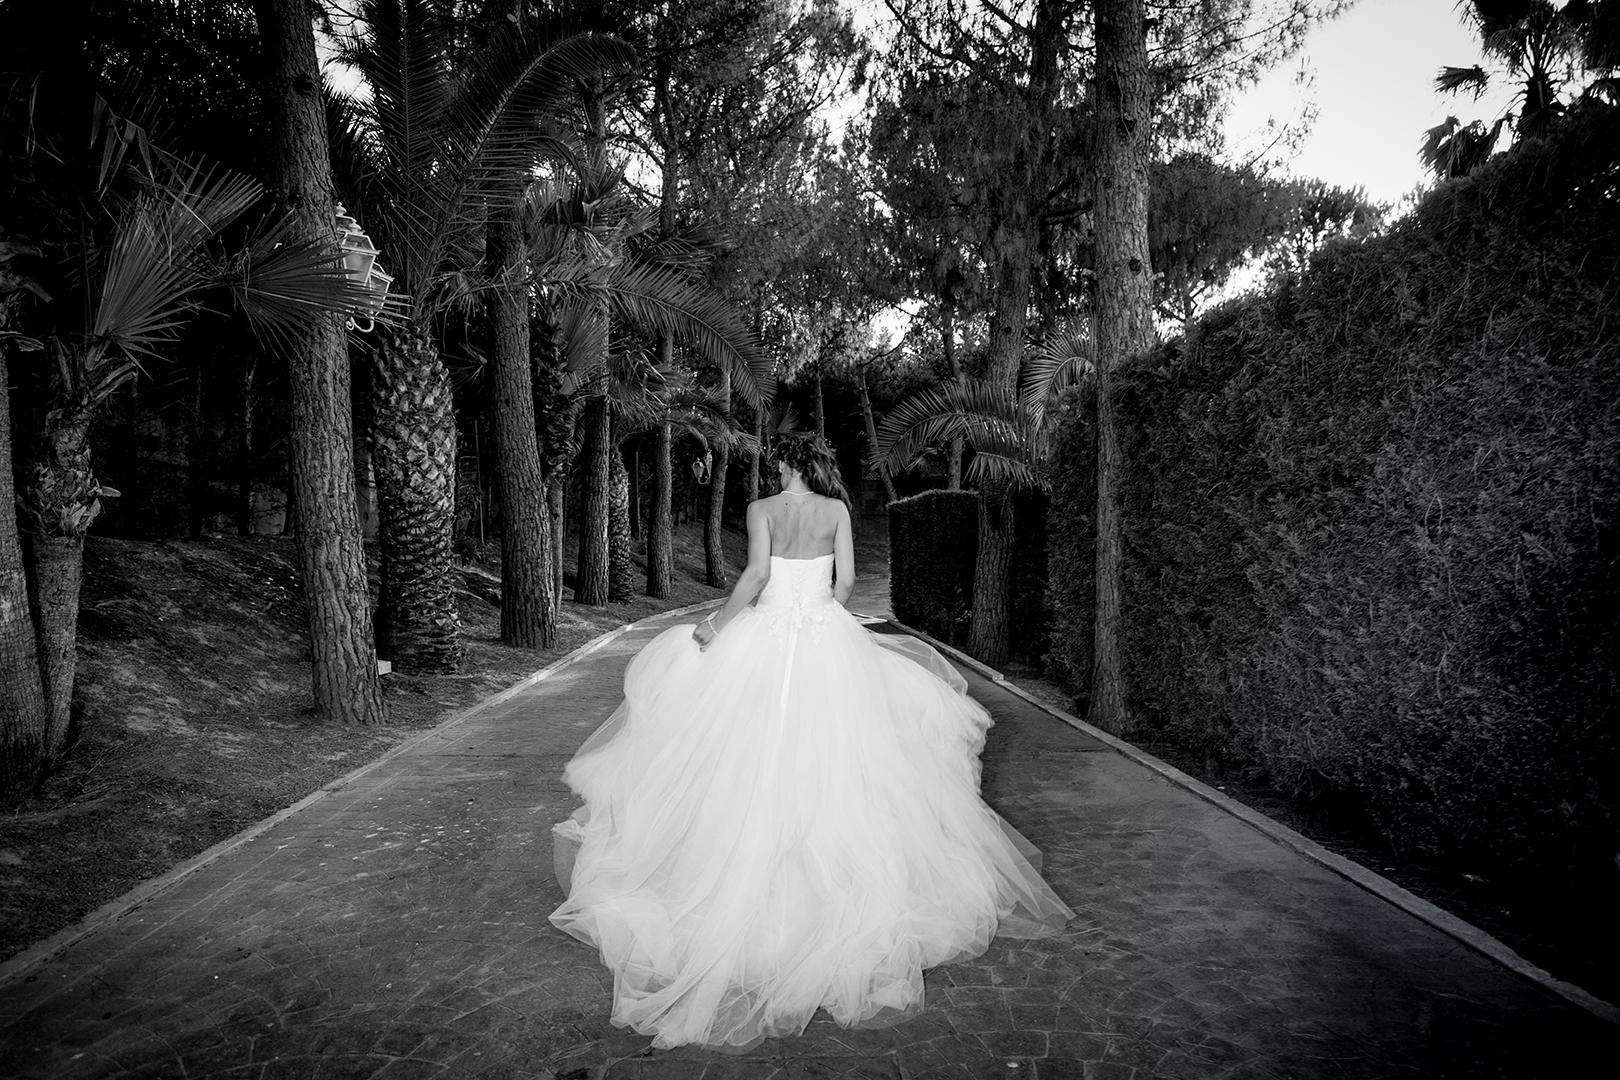 gianni-lepore-sposa-bride-smeraldo